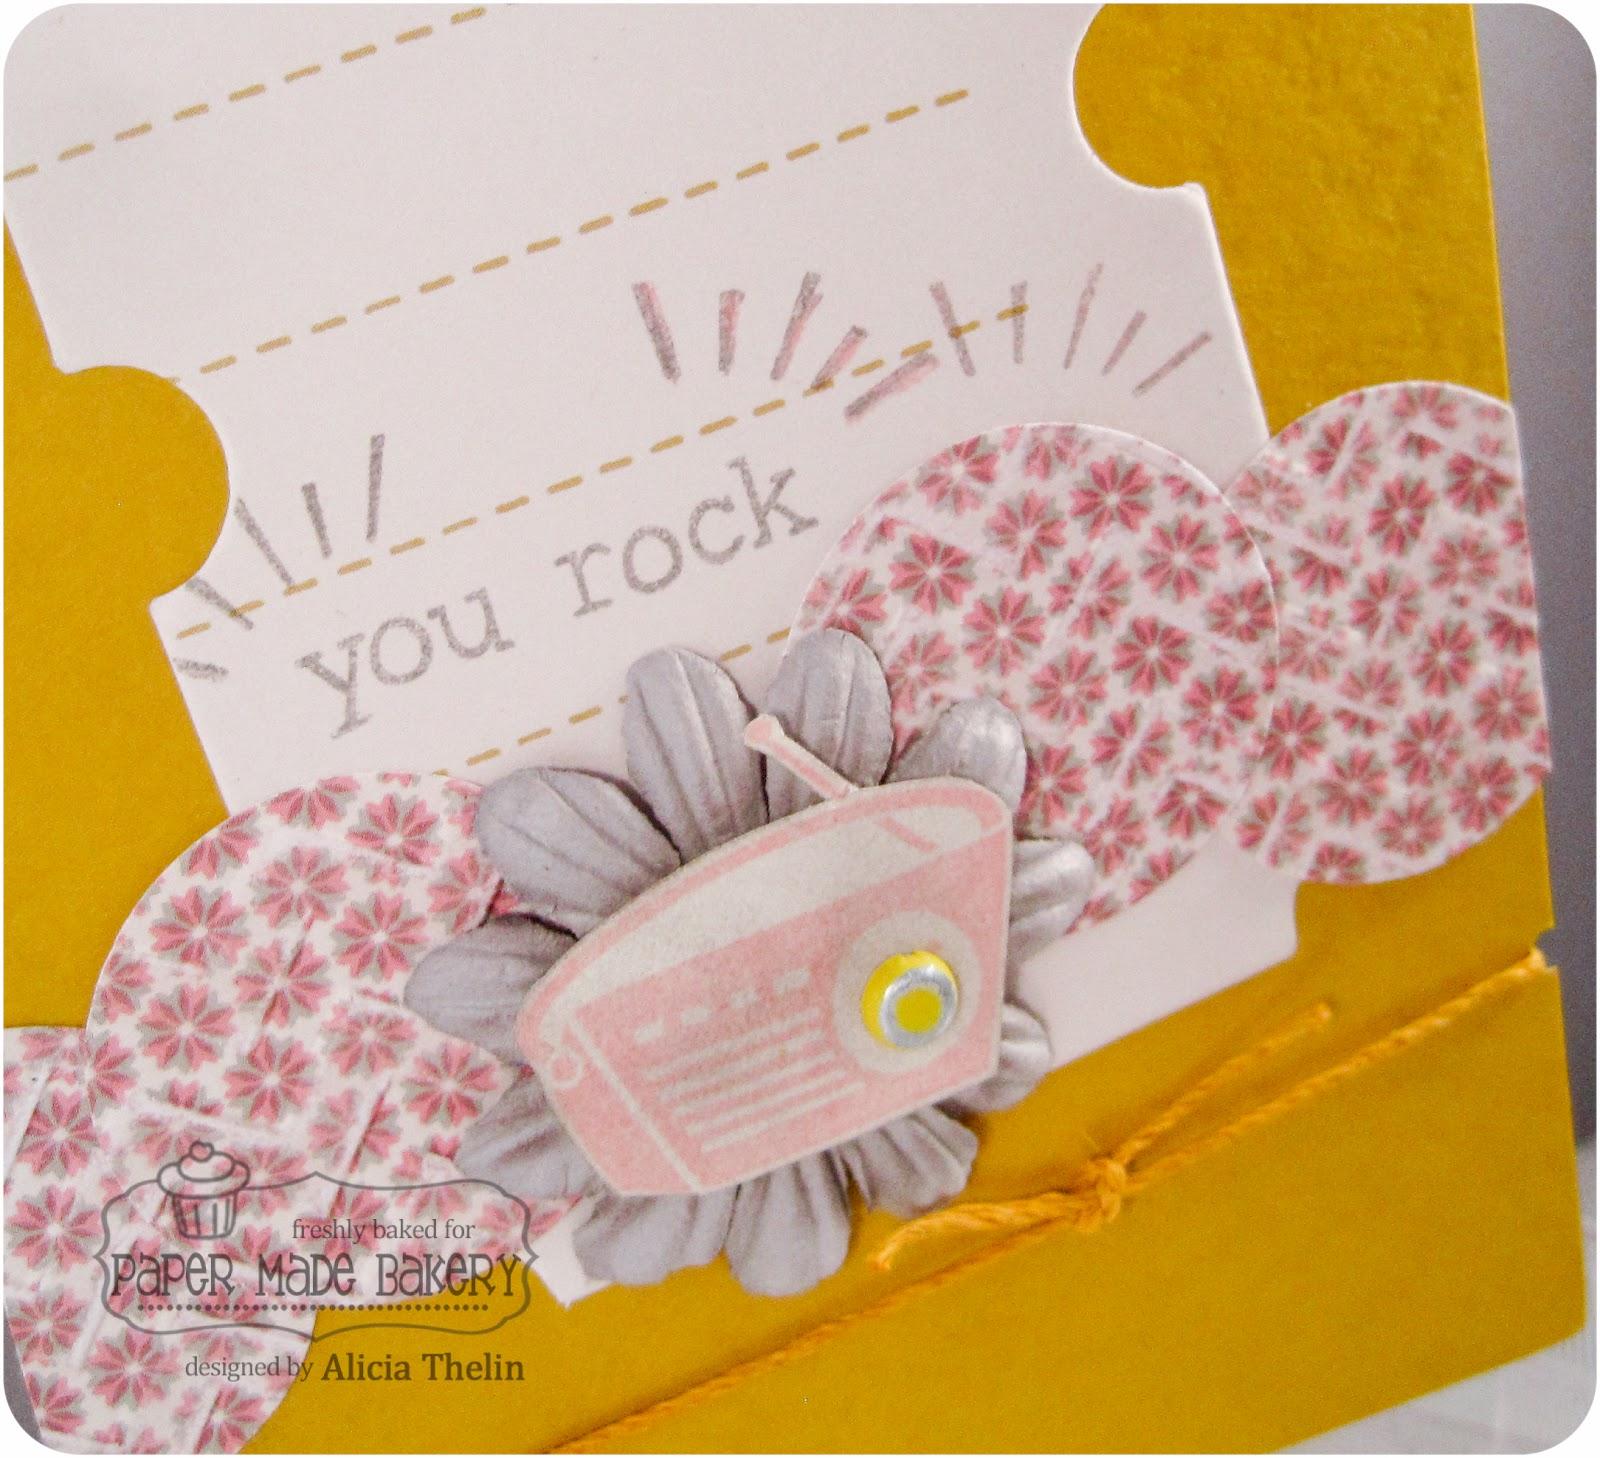 http://4.bp.blogspot.com/-622QDmVpEw8/UEjo82_mfRI/AAAAAAAAGr4/ka6d_jxg54I/s1600/PMBSept20120YouRockCard+(2+of+2).jpg